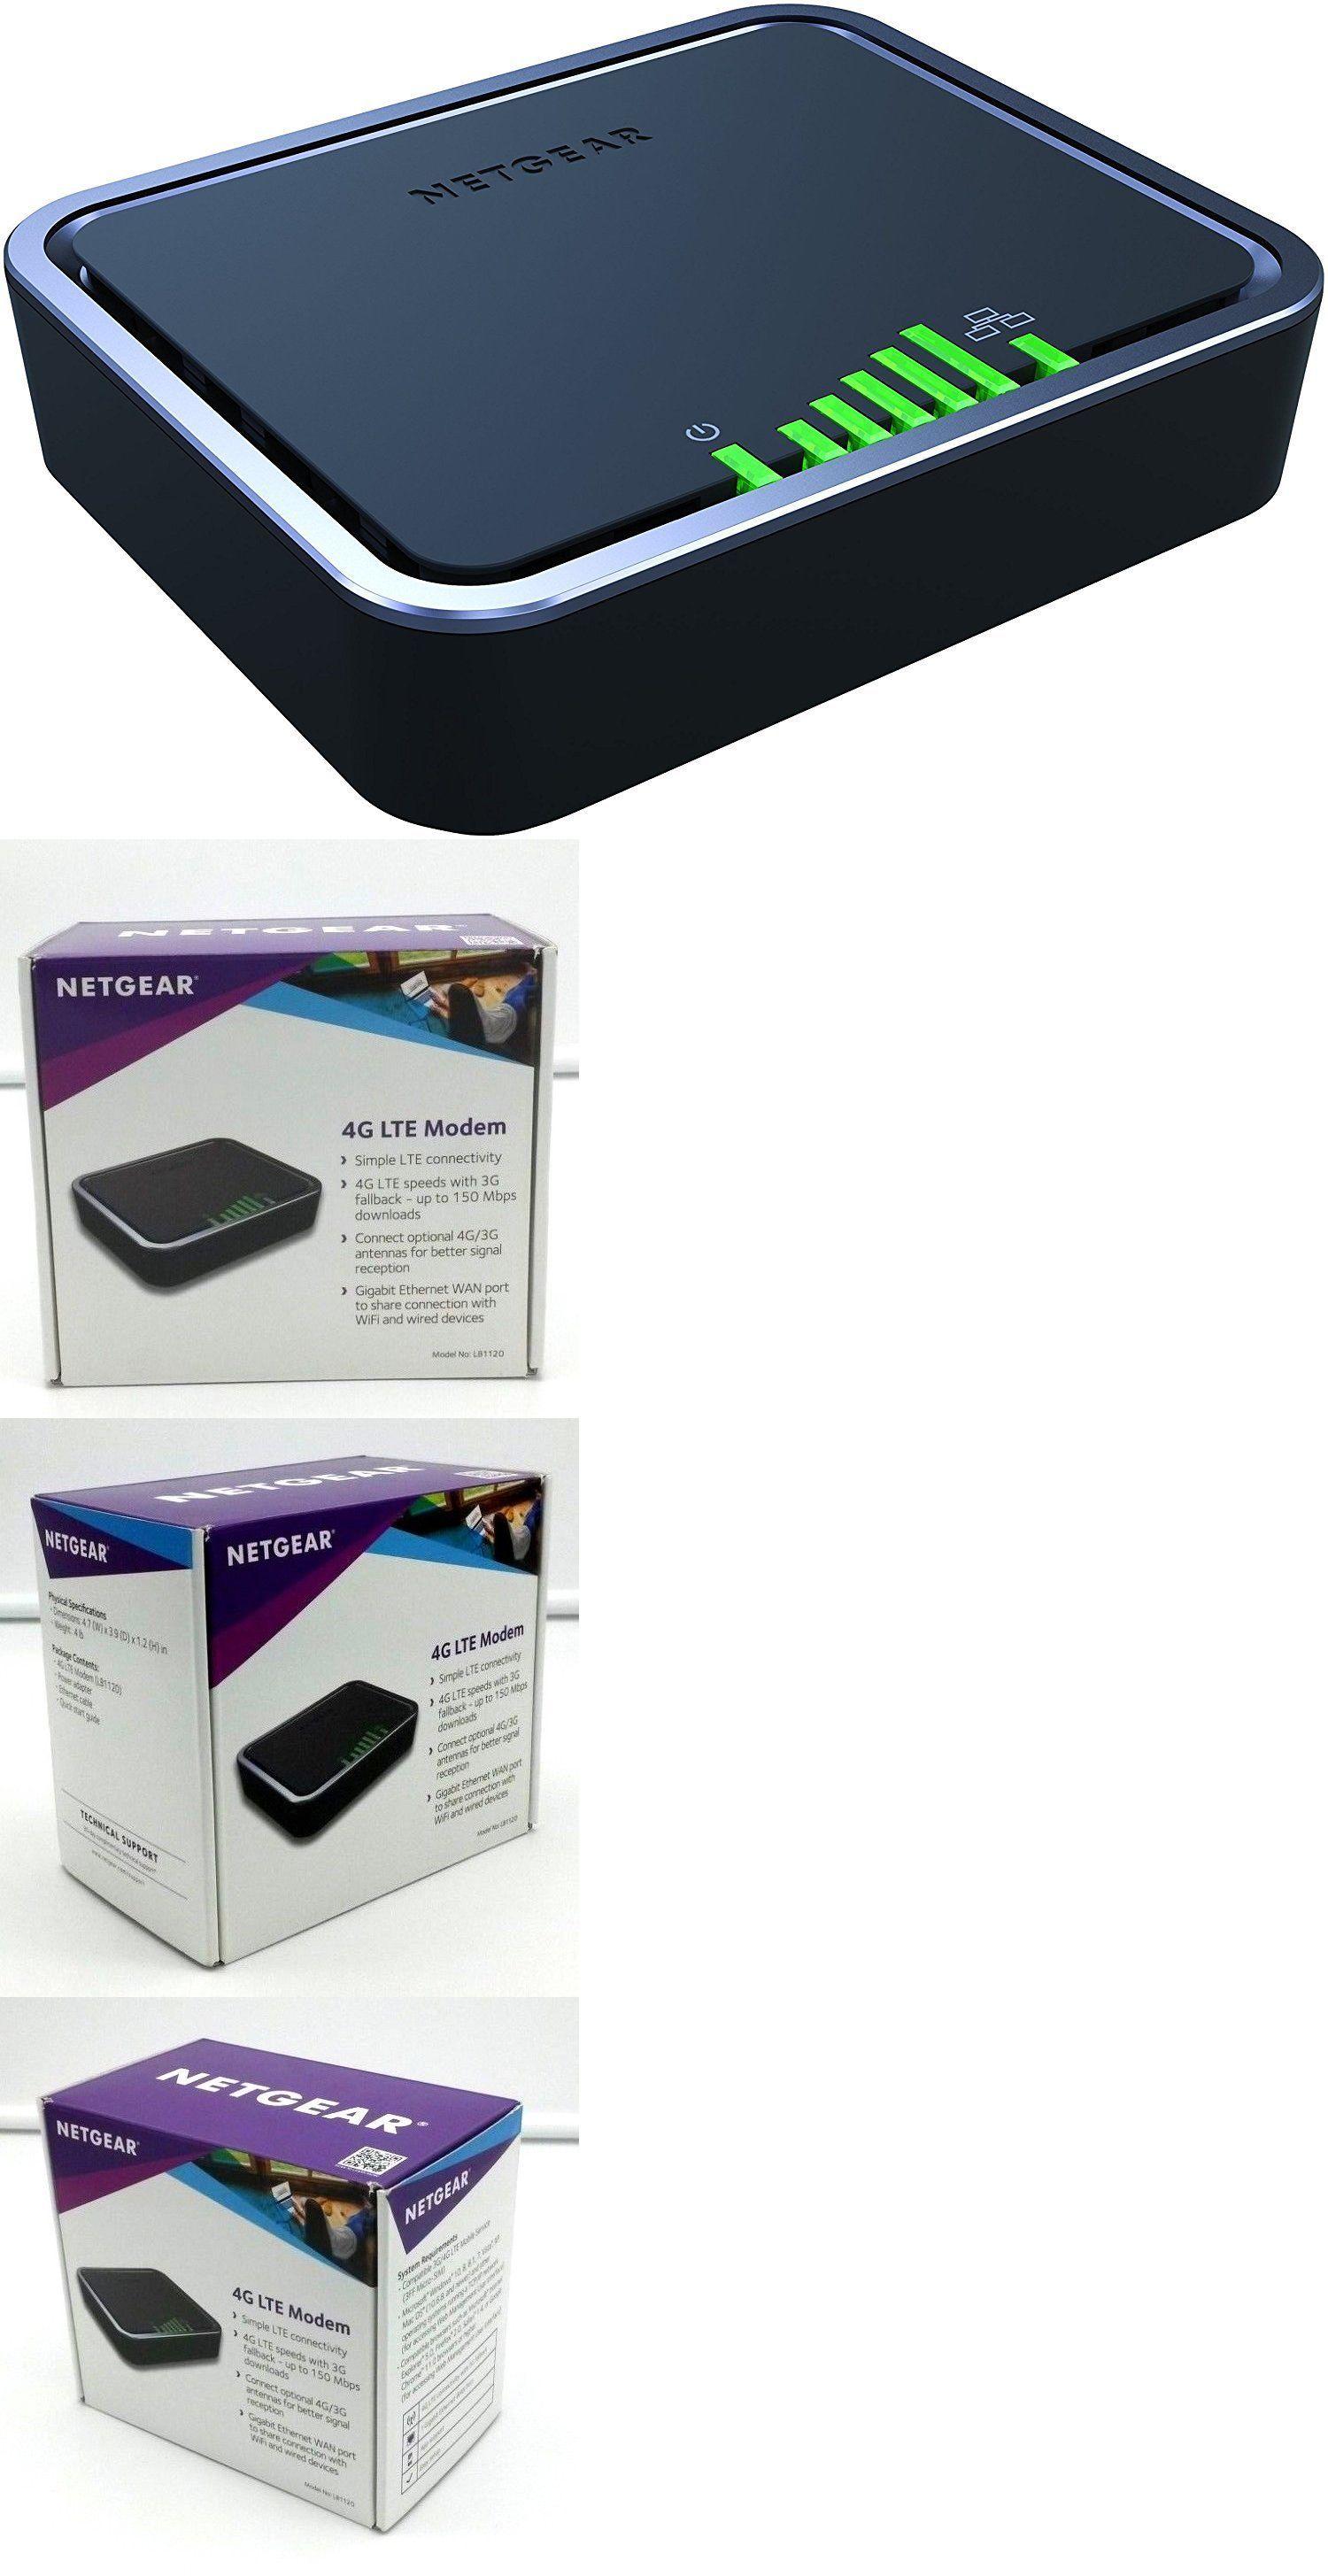 Modem-Router Combos 101270: Netgear Lb1120 4G Lte Modem W